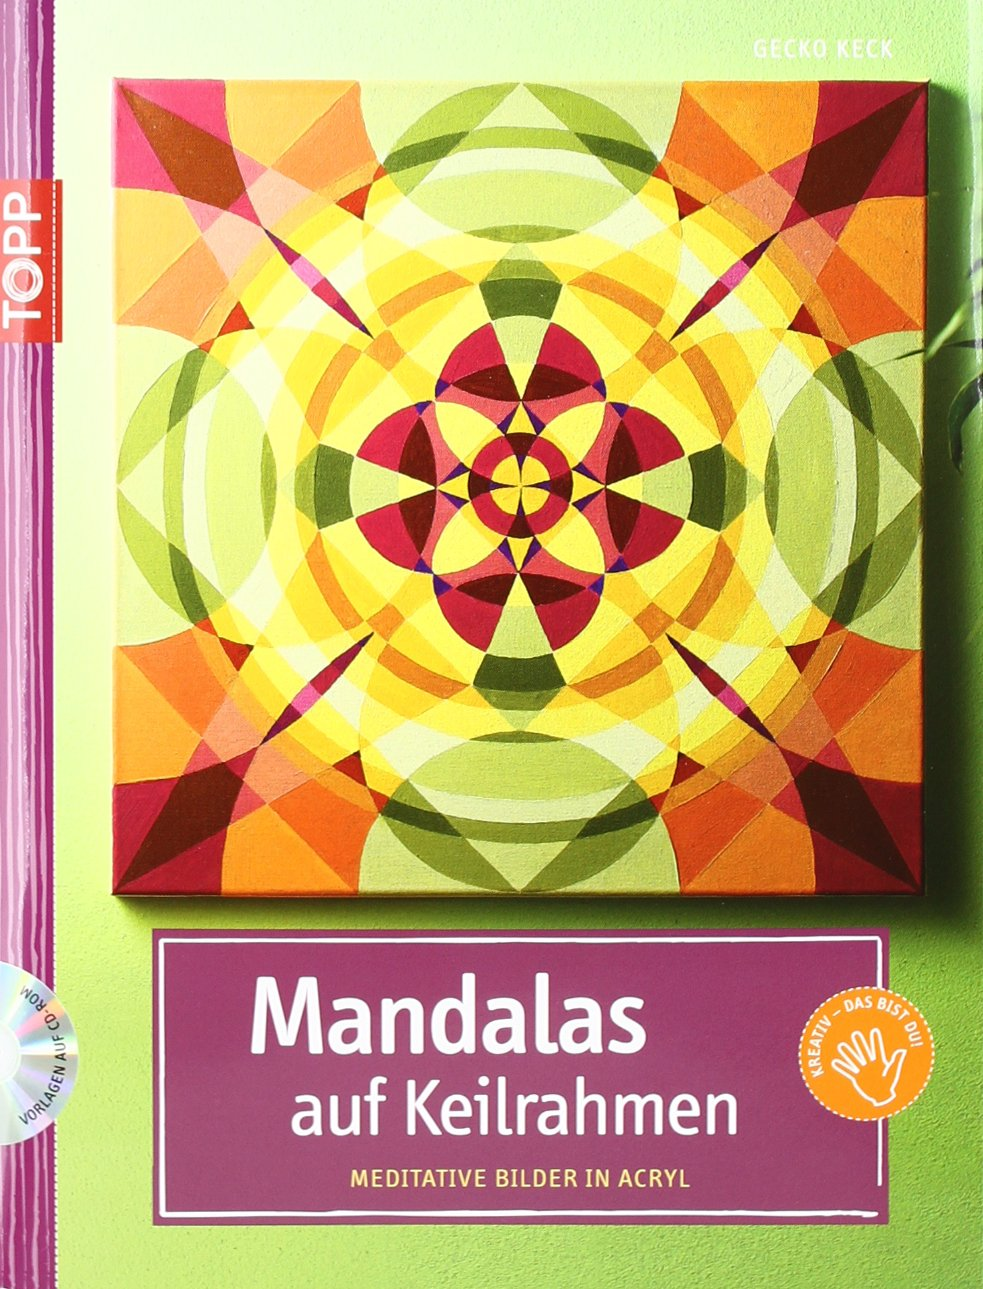 Mandalas auf Keilrahmen Meditative Bilder in Acryl Amazonde